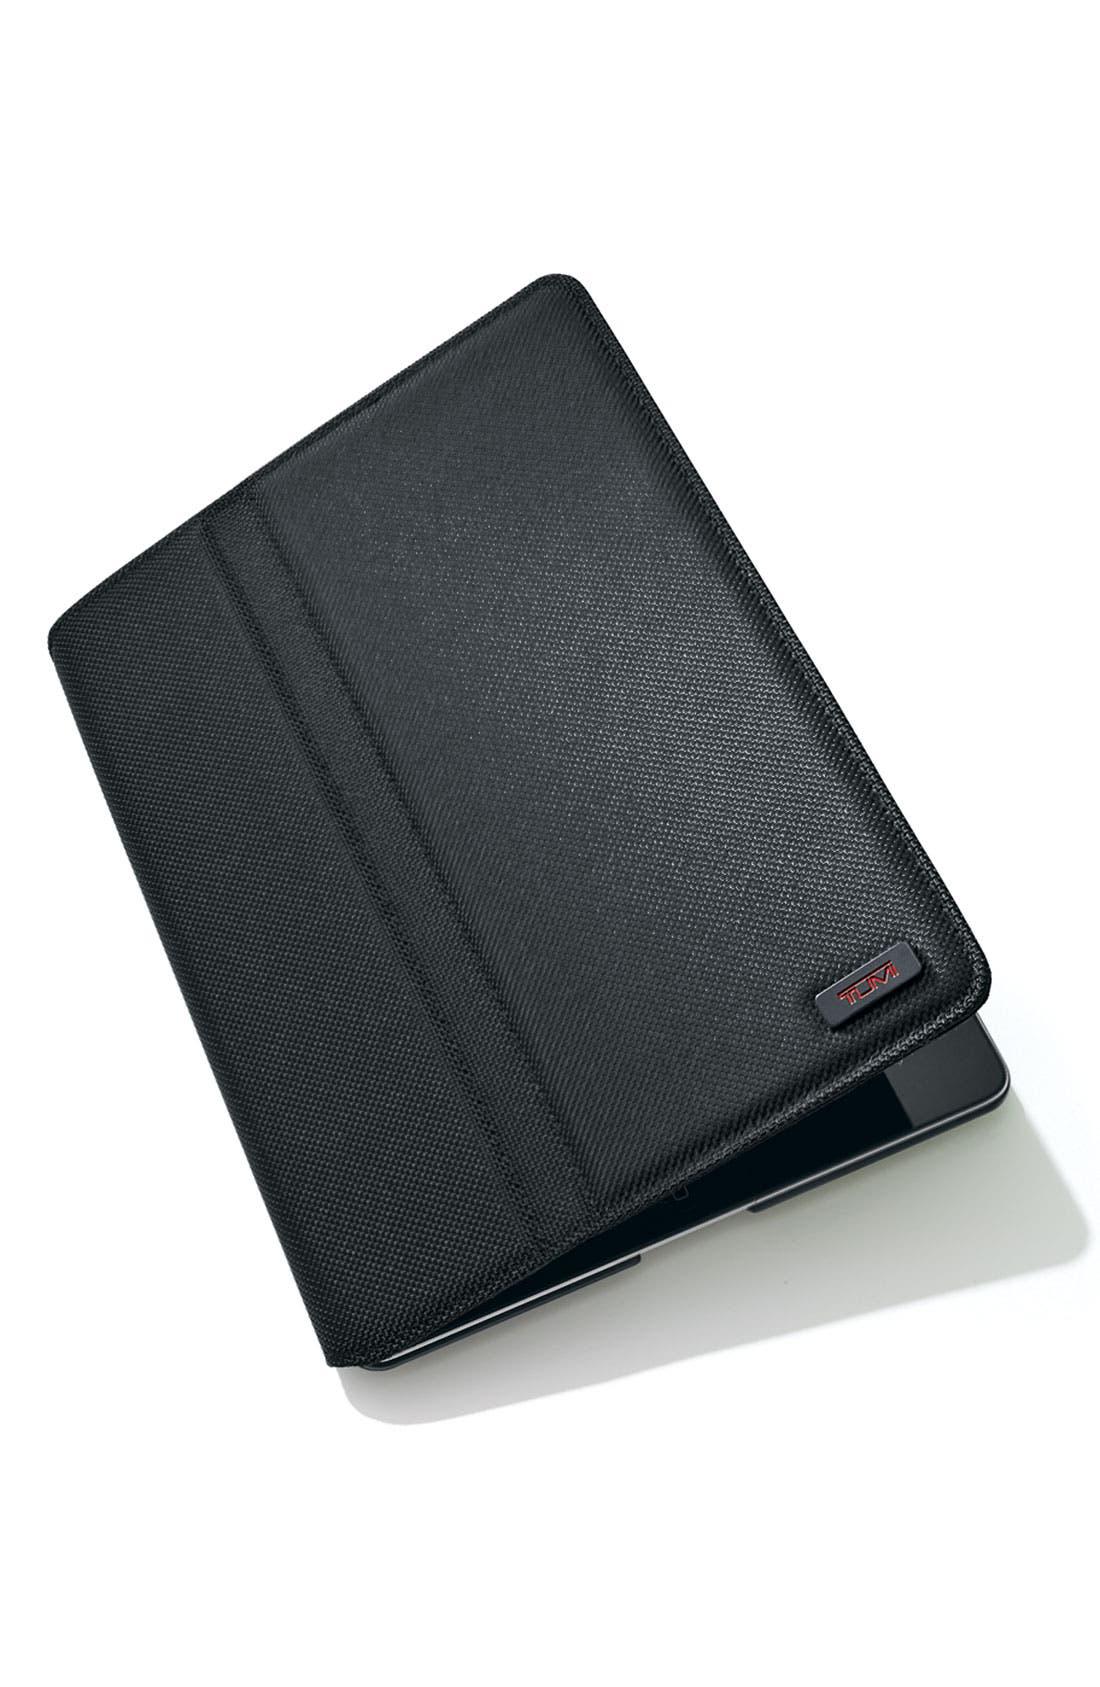 Alternate Image 2  - Tumi Ballistic Nylon iPad 2 Cover